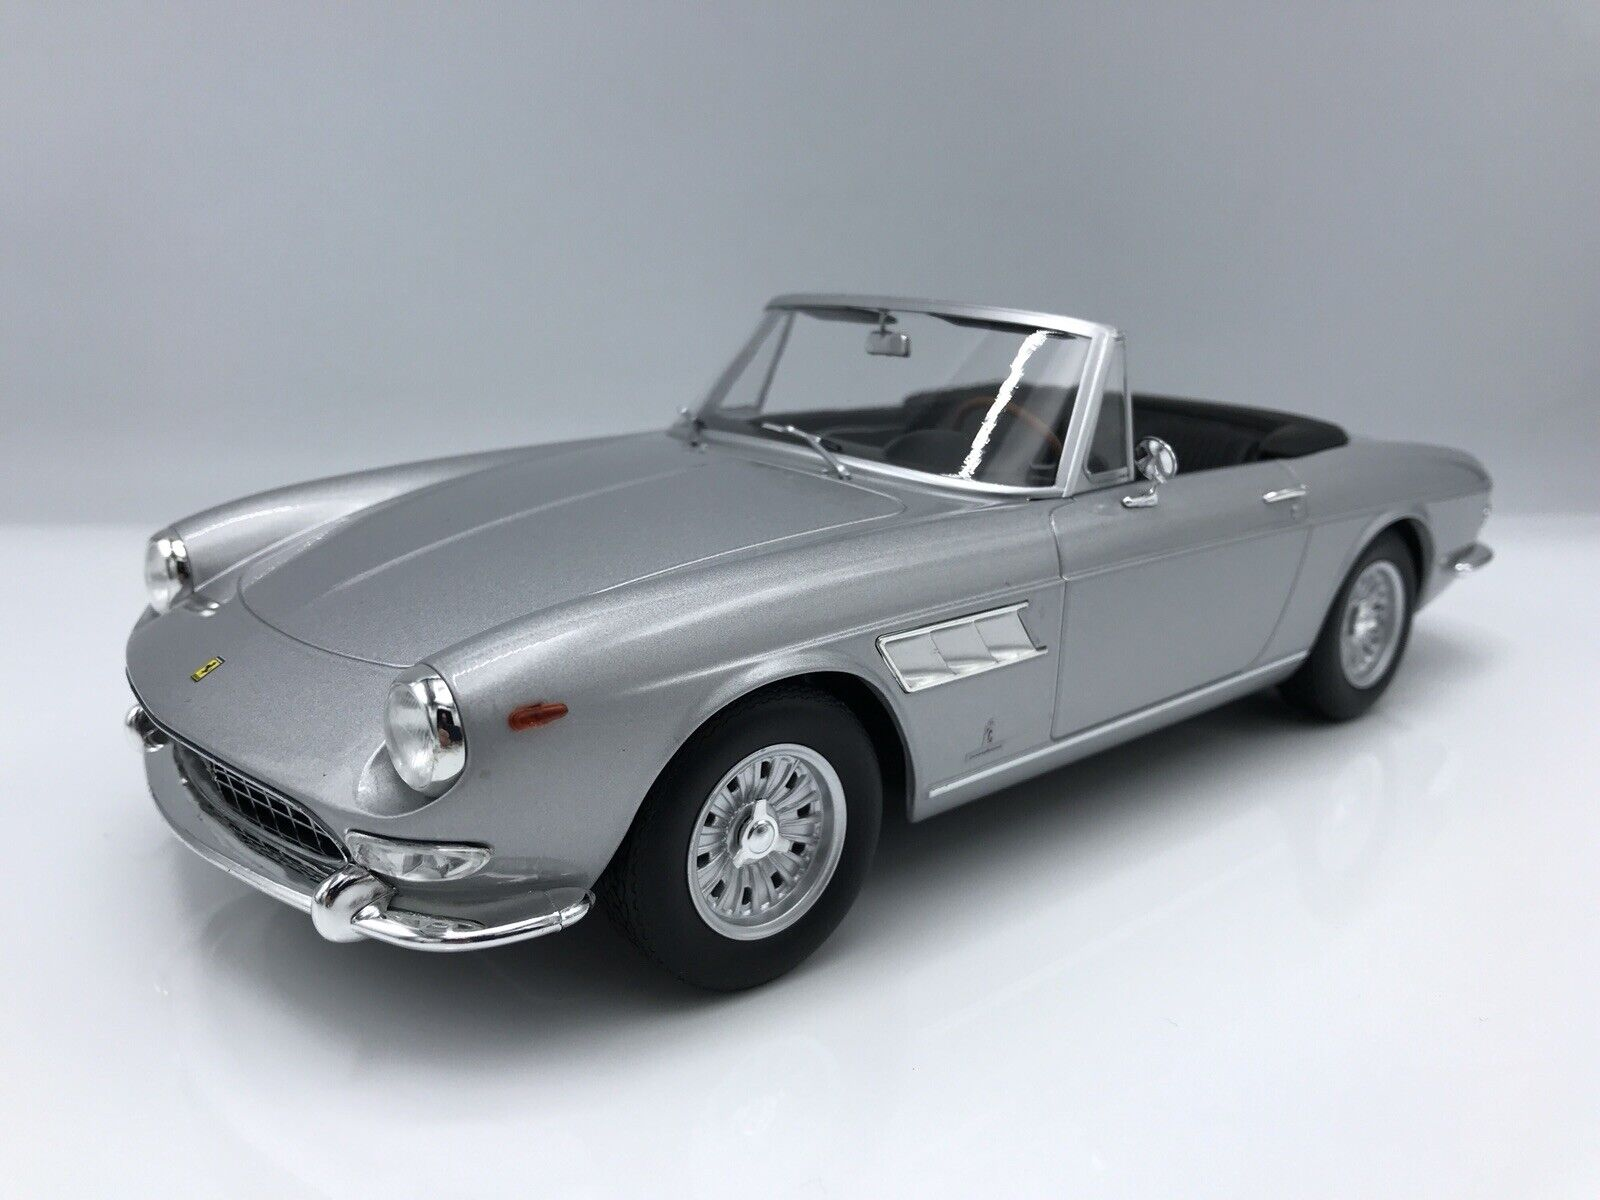 Ferrari 275 GTS Pininfarina Spyder argento (acero llantas) 1964 1 18 KK-scale   New